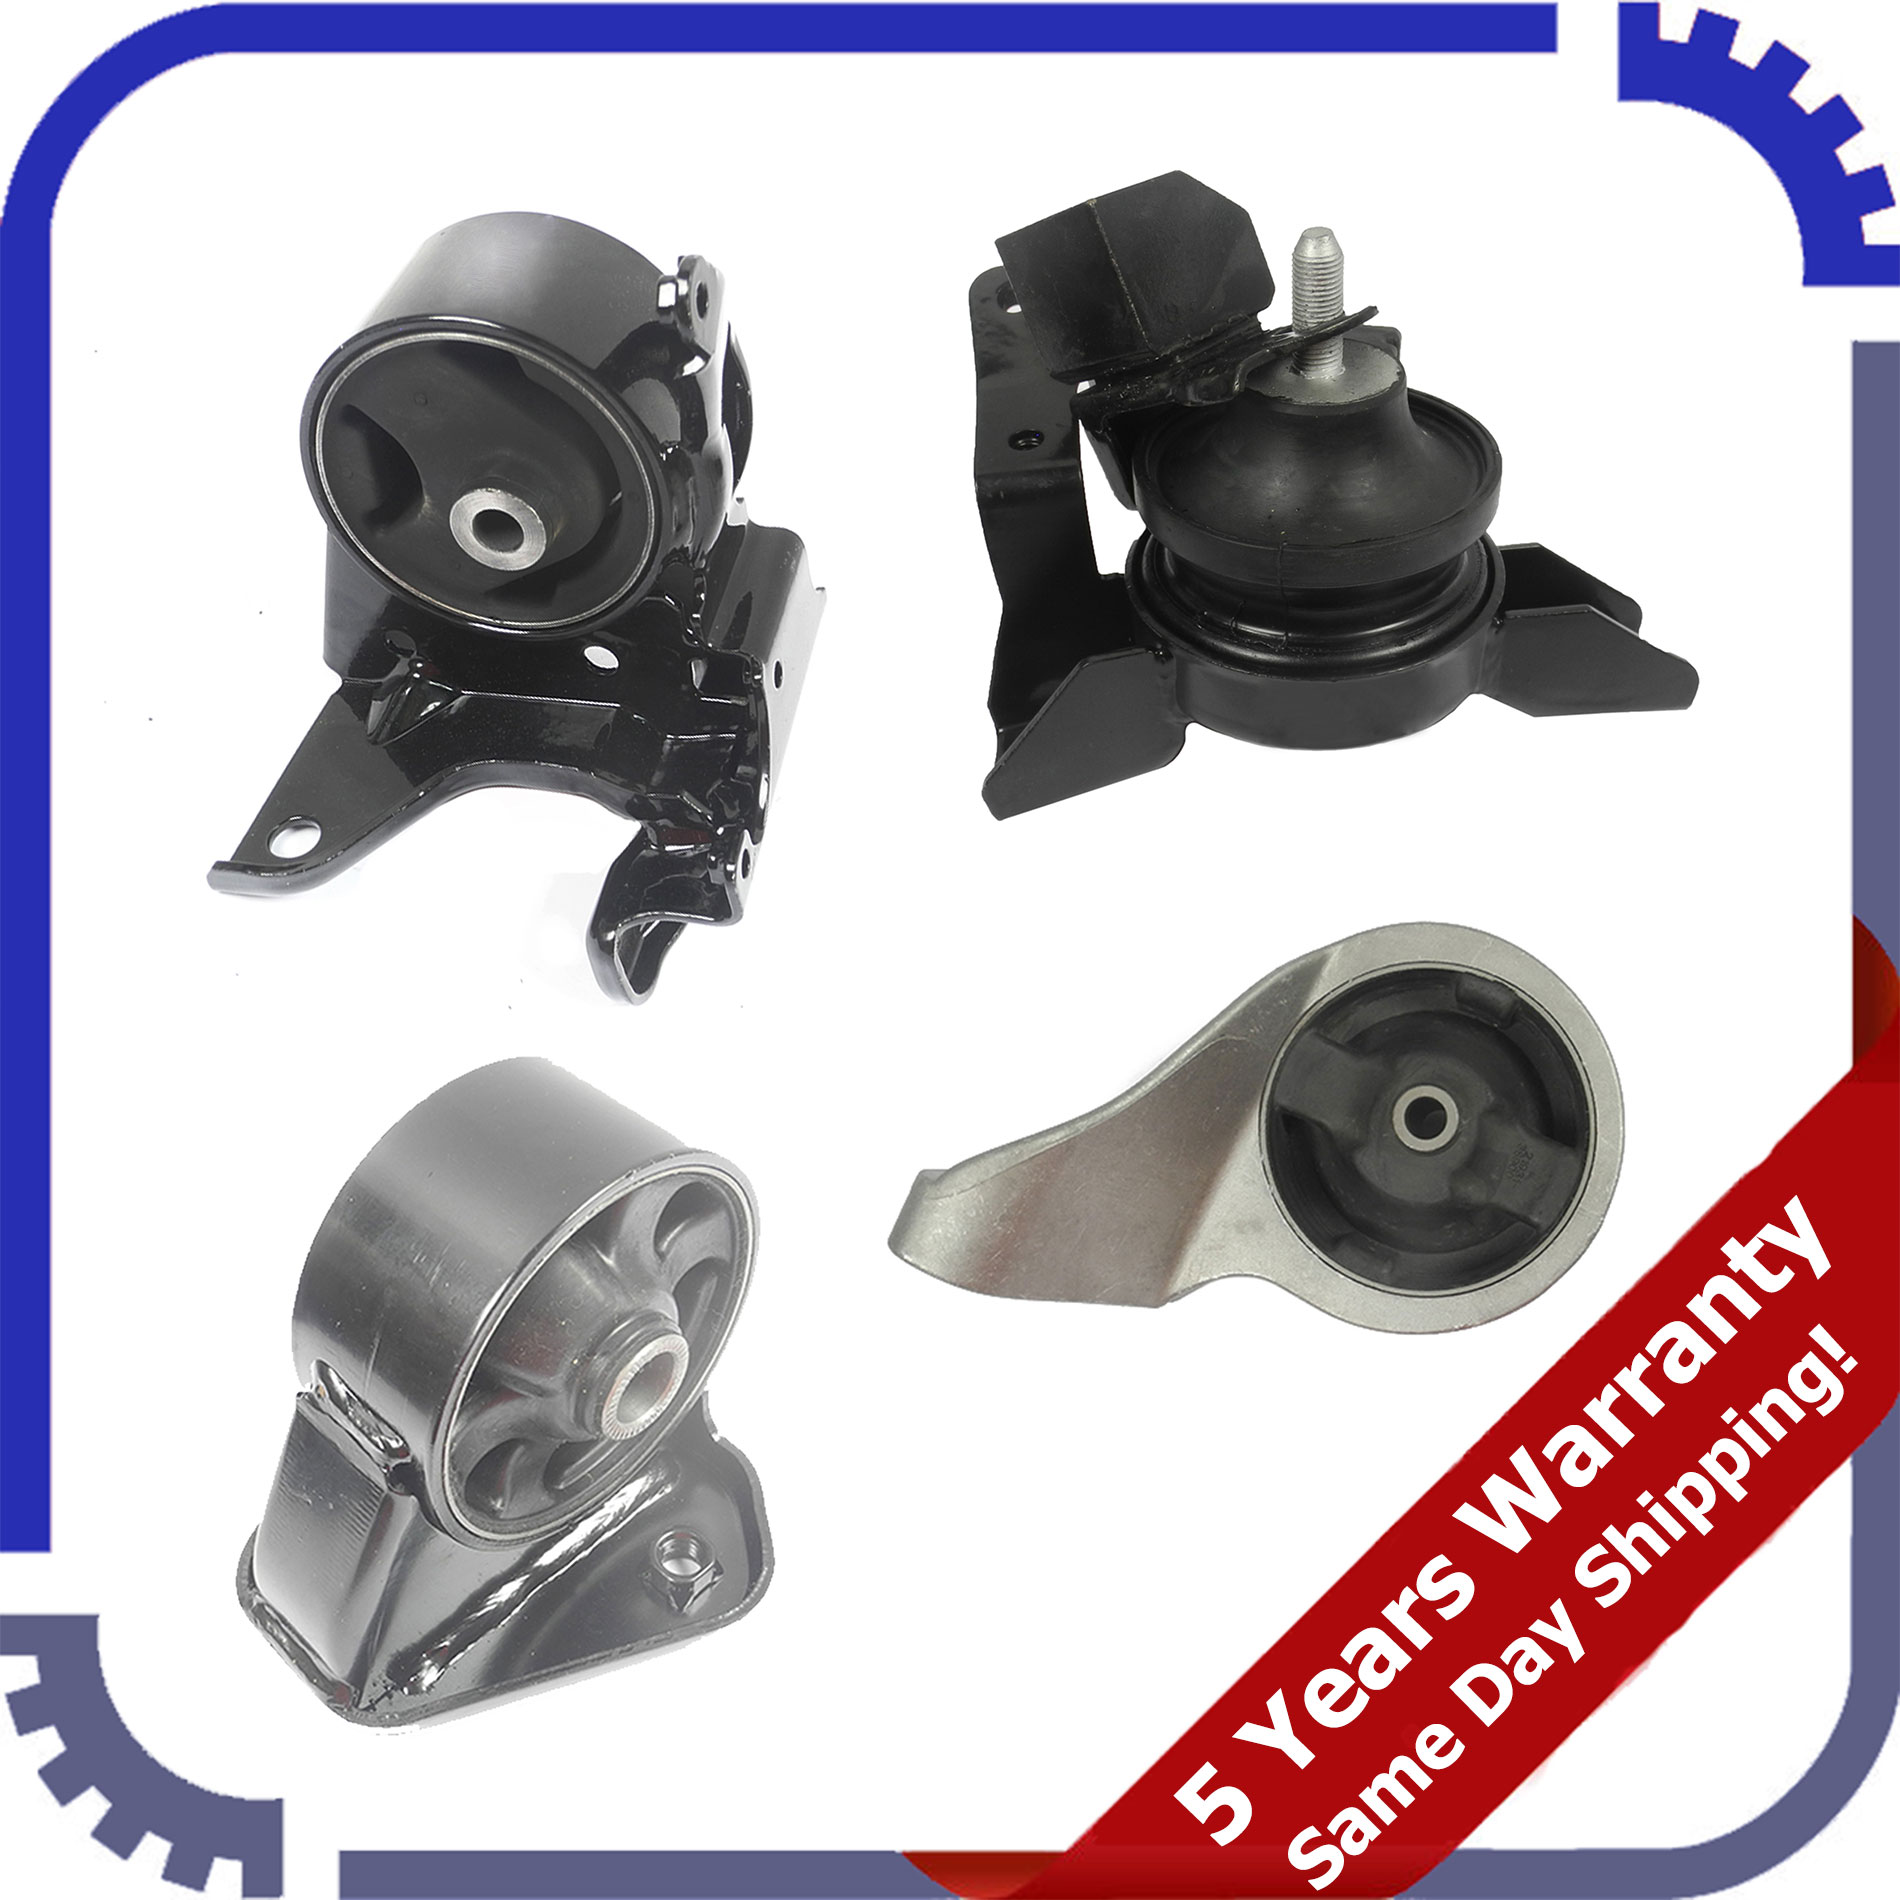 01-06 2.7L 7124 Front Right Engine Motor Mount For Hyundai Santa Fe 01-04 2.4L